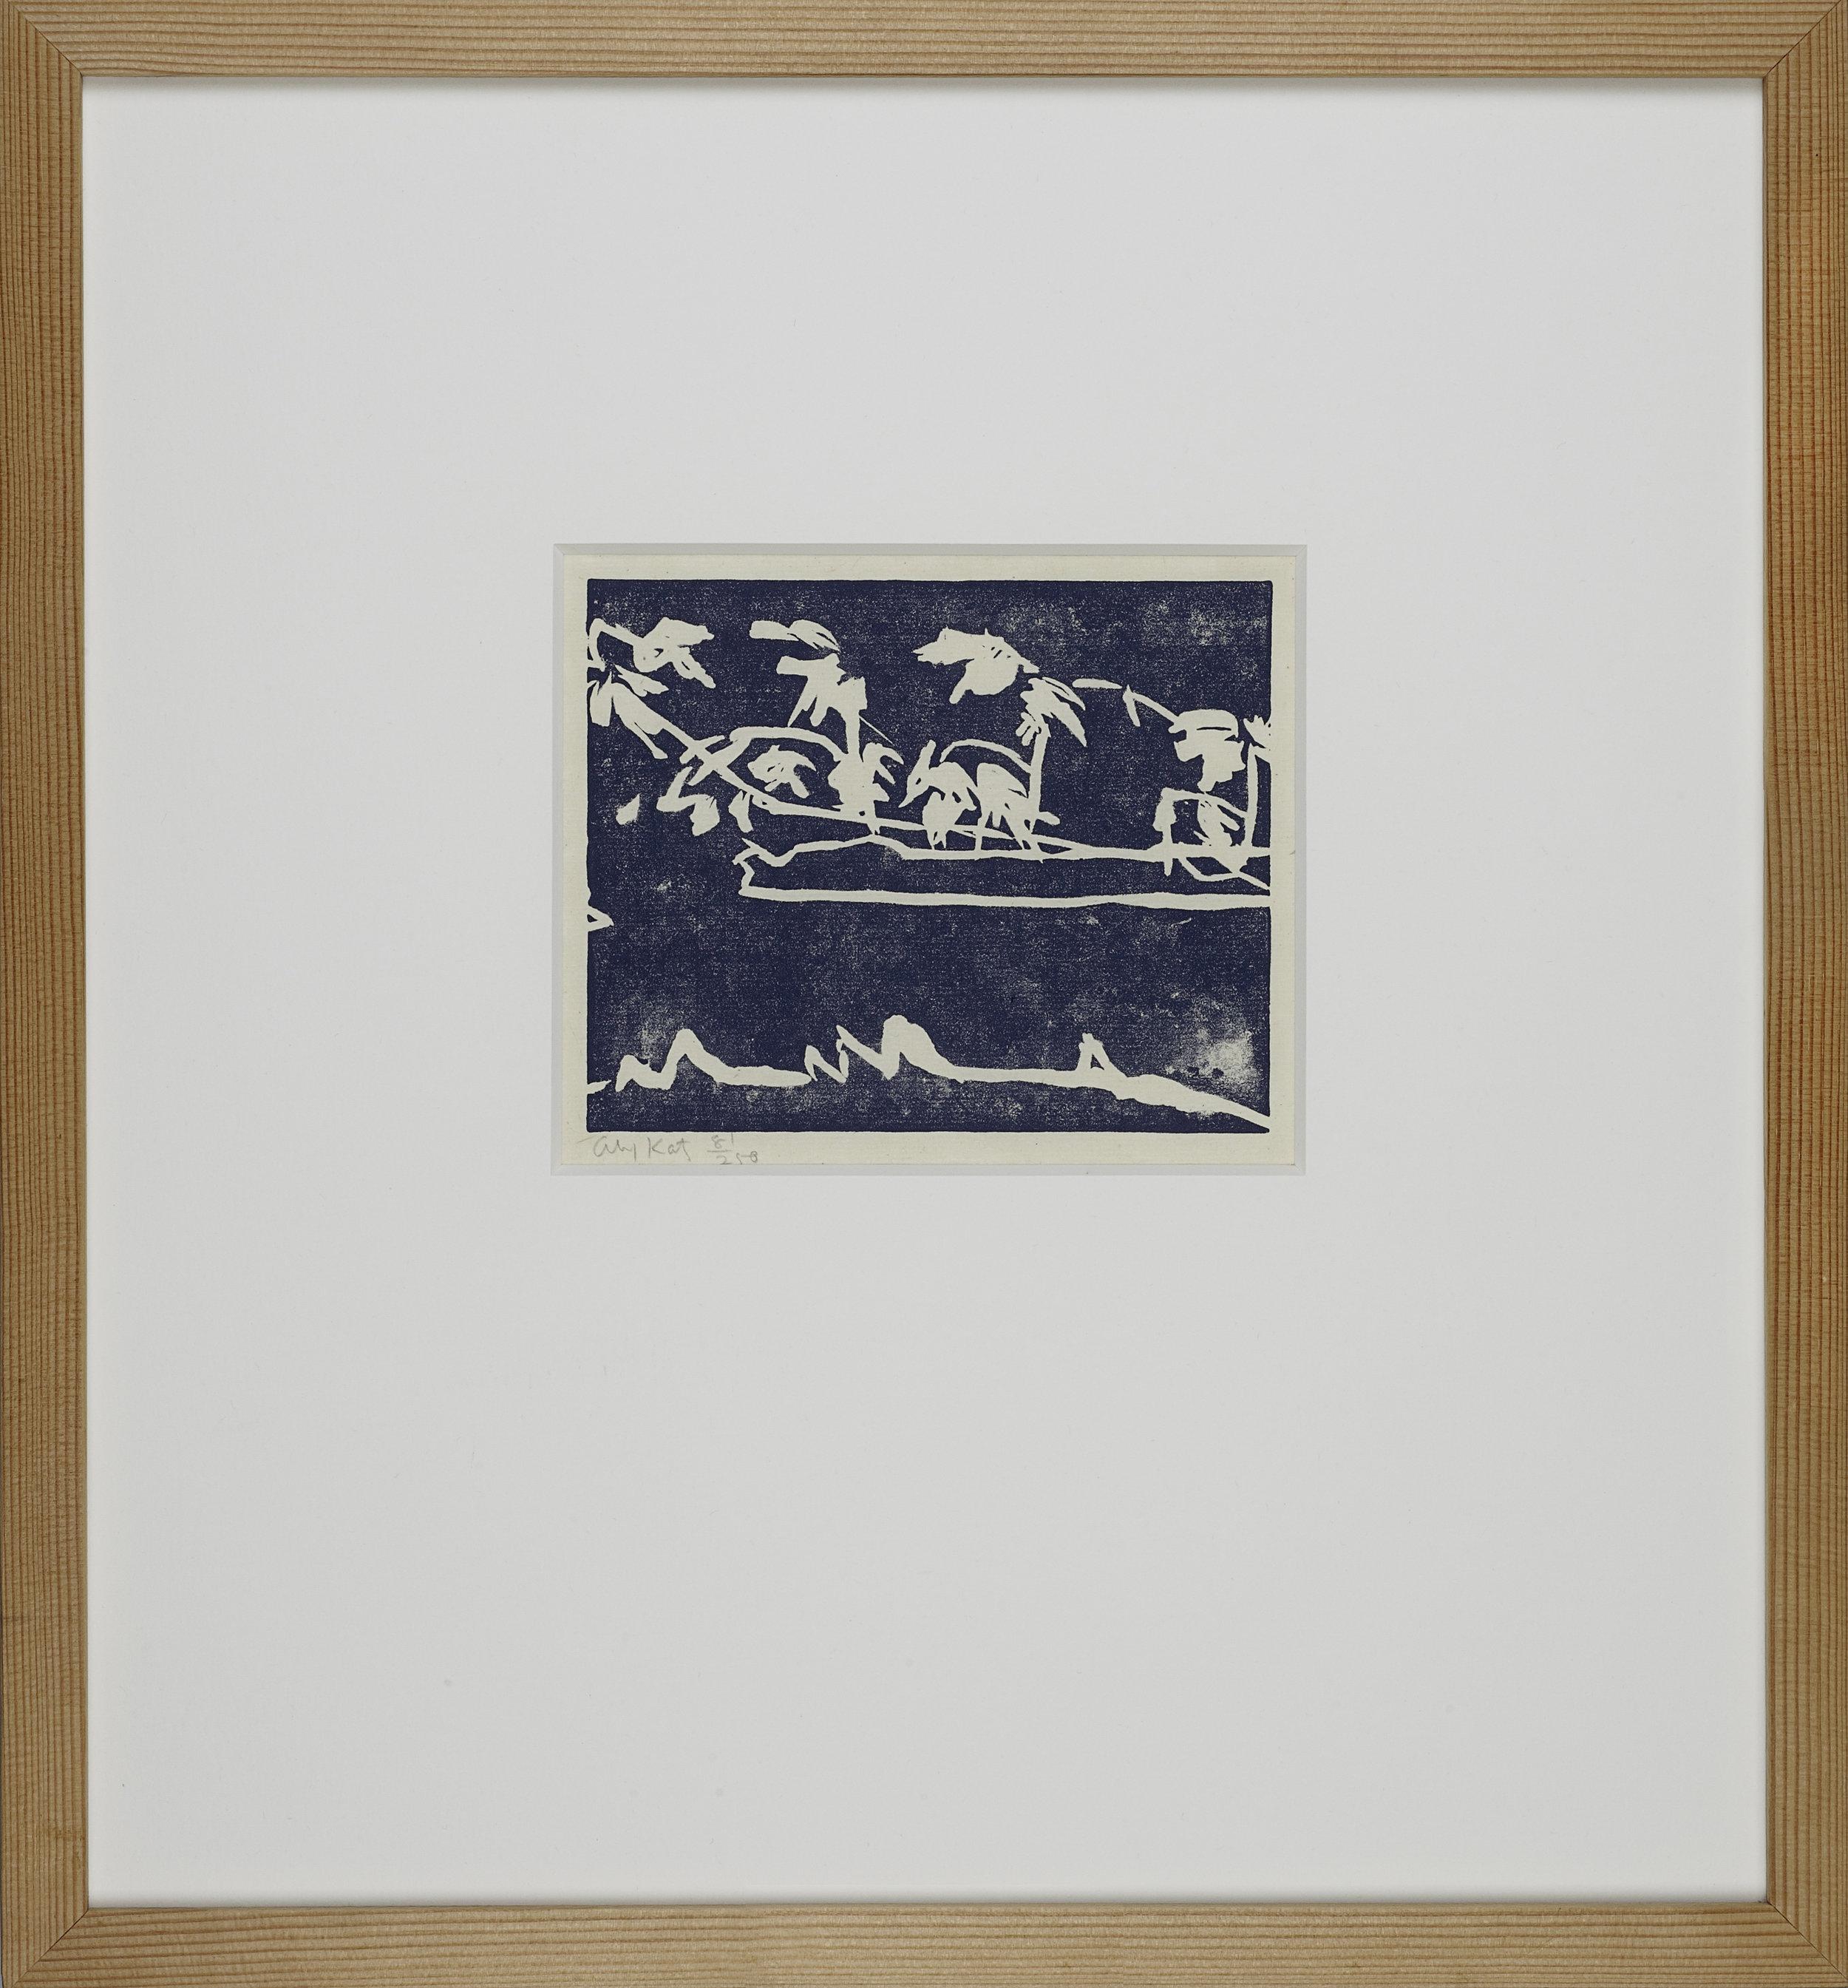 Coleman´s pond  . Linolschnitt . Edition 250 .  1.200 Euro